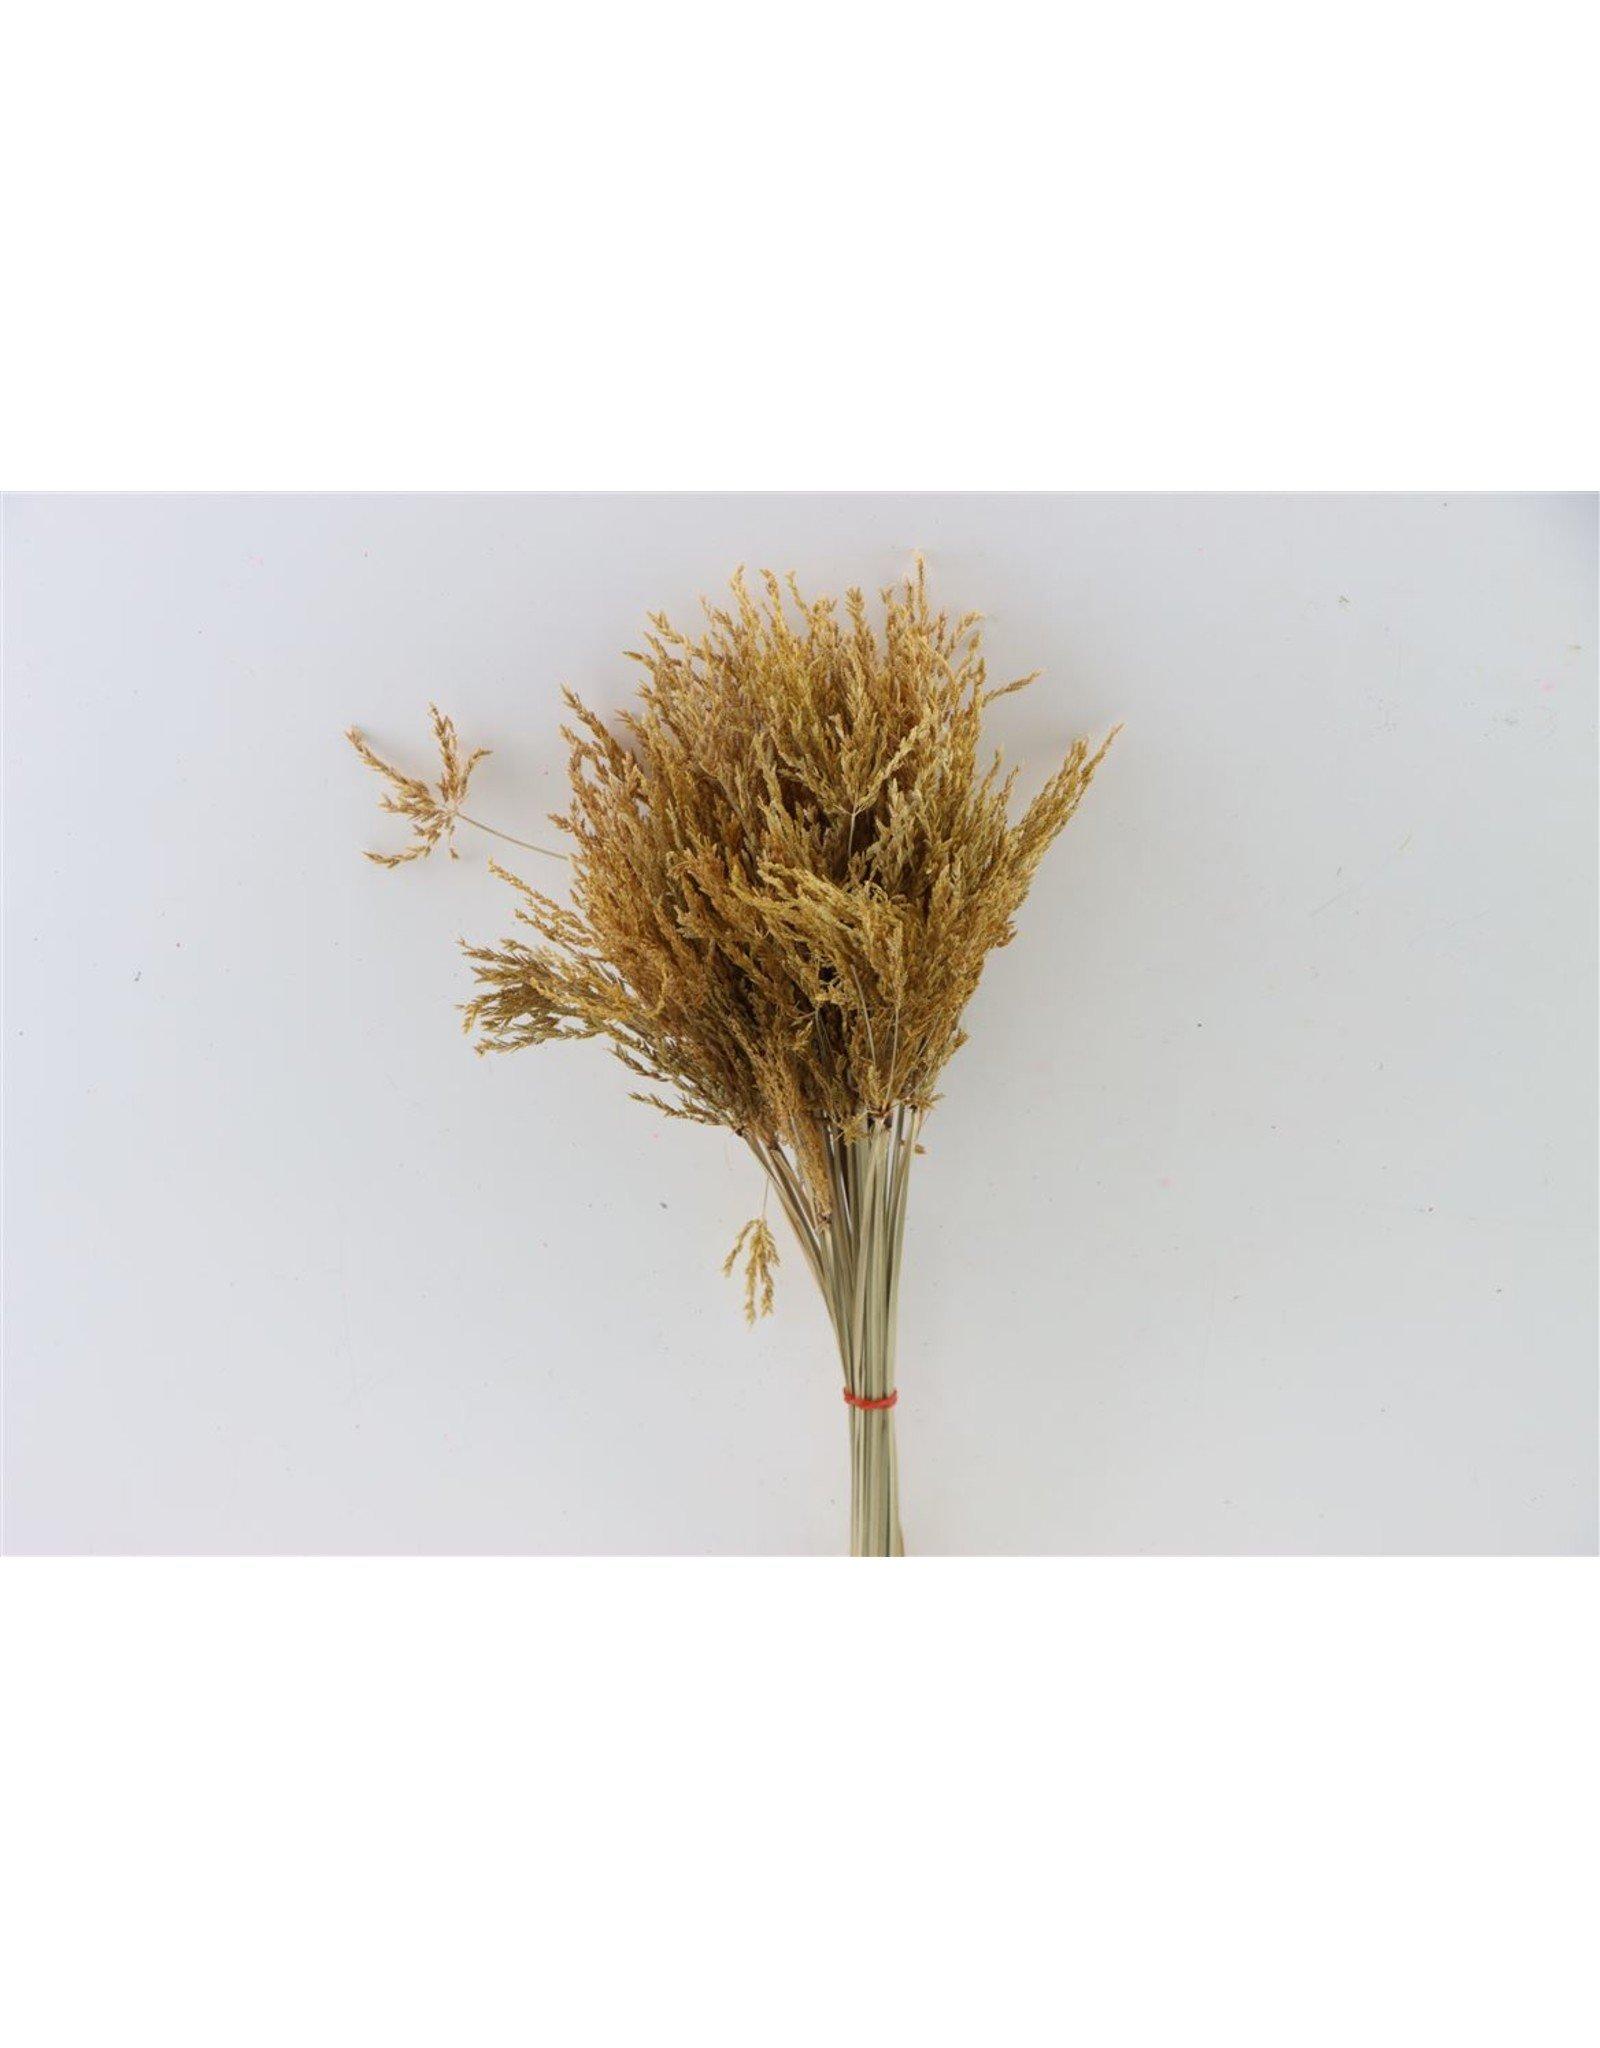 Dried Umbr. Sedge Sm. Leaf Natural Bunch x 20